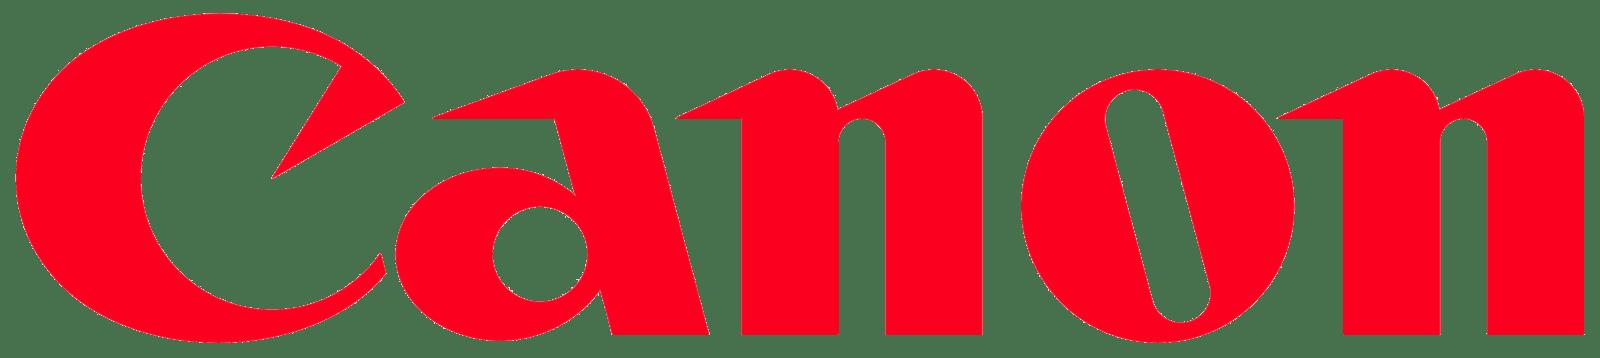 Canon, Digital Imaging Partner di Eccellenze Italiane